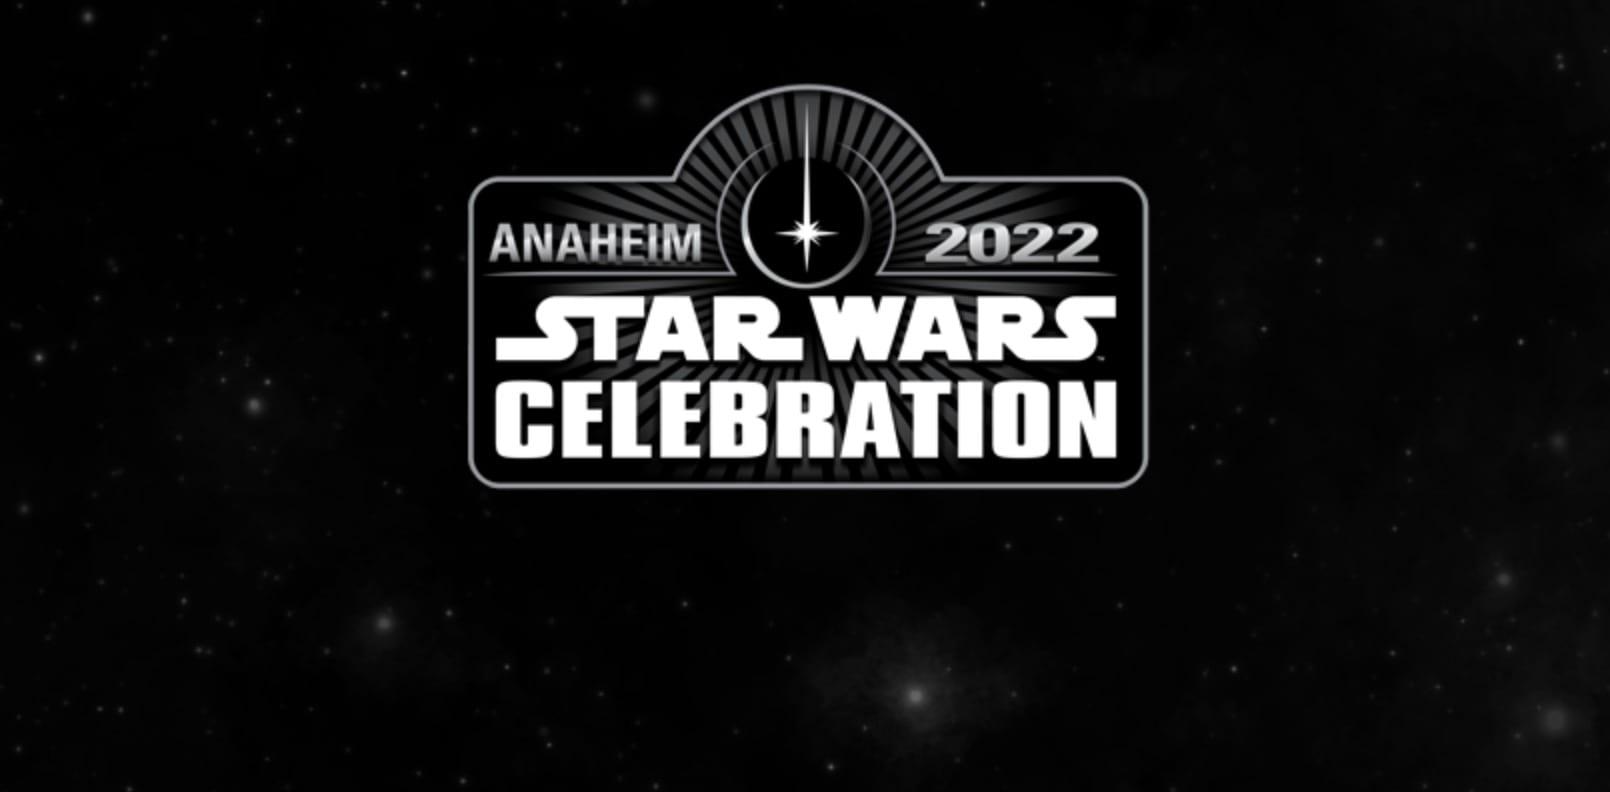 Star Wars Celebration 2020 rimandata al 2022